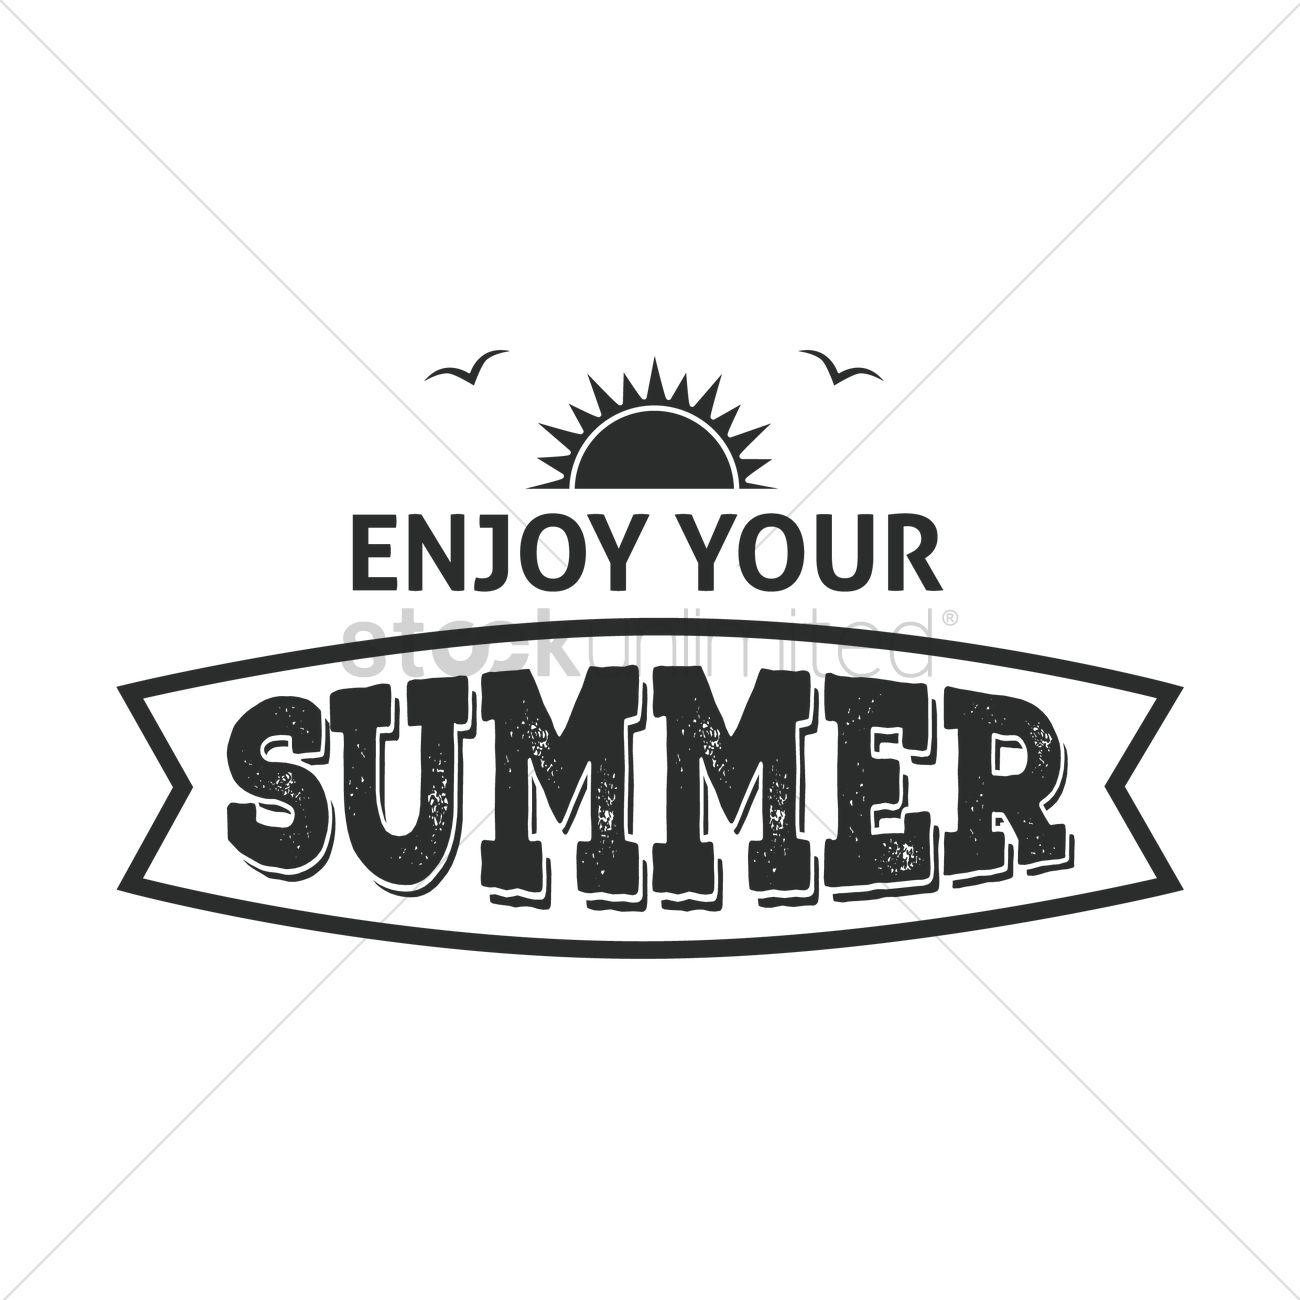 enjoy your summer label vector image 1872679 stockunlimited